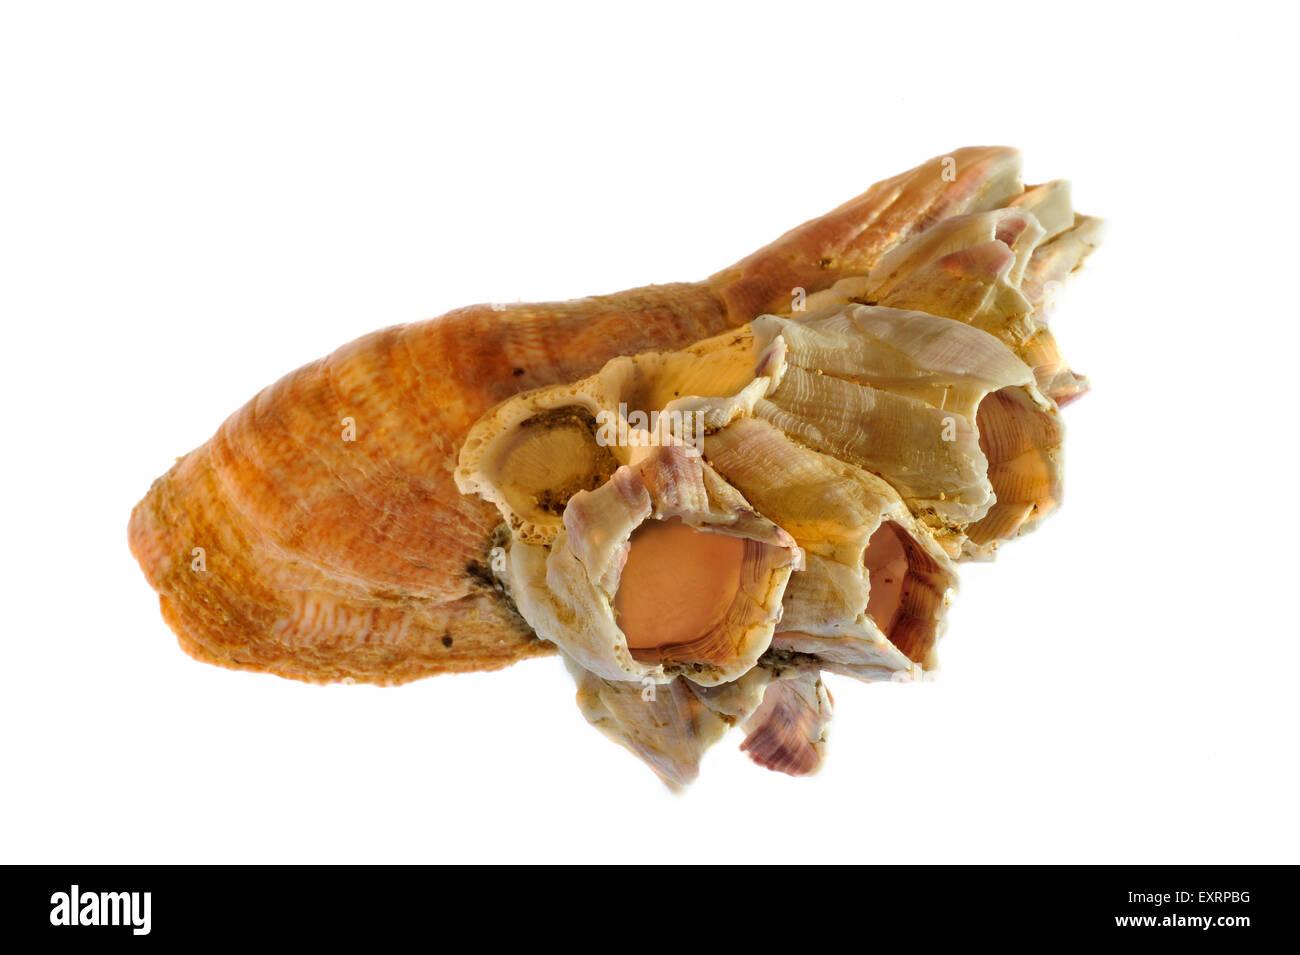 Acorn barnacle (Megabalanus tintinnabulum) growing on American slipper limpet (Crepidula fornicata) on white background Stock Photo